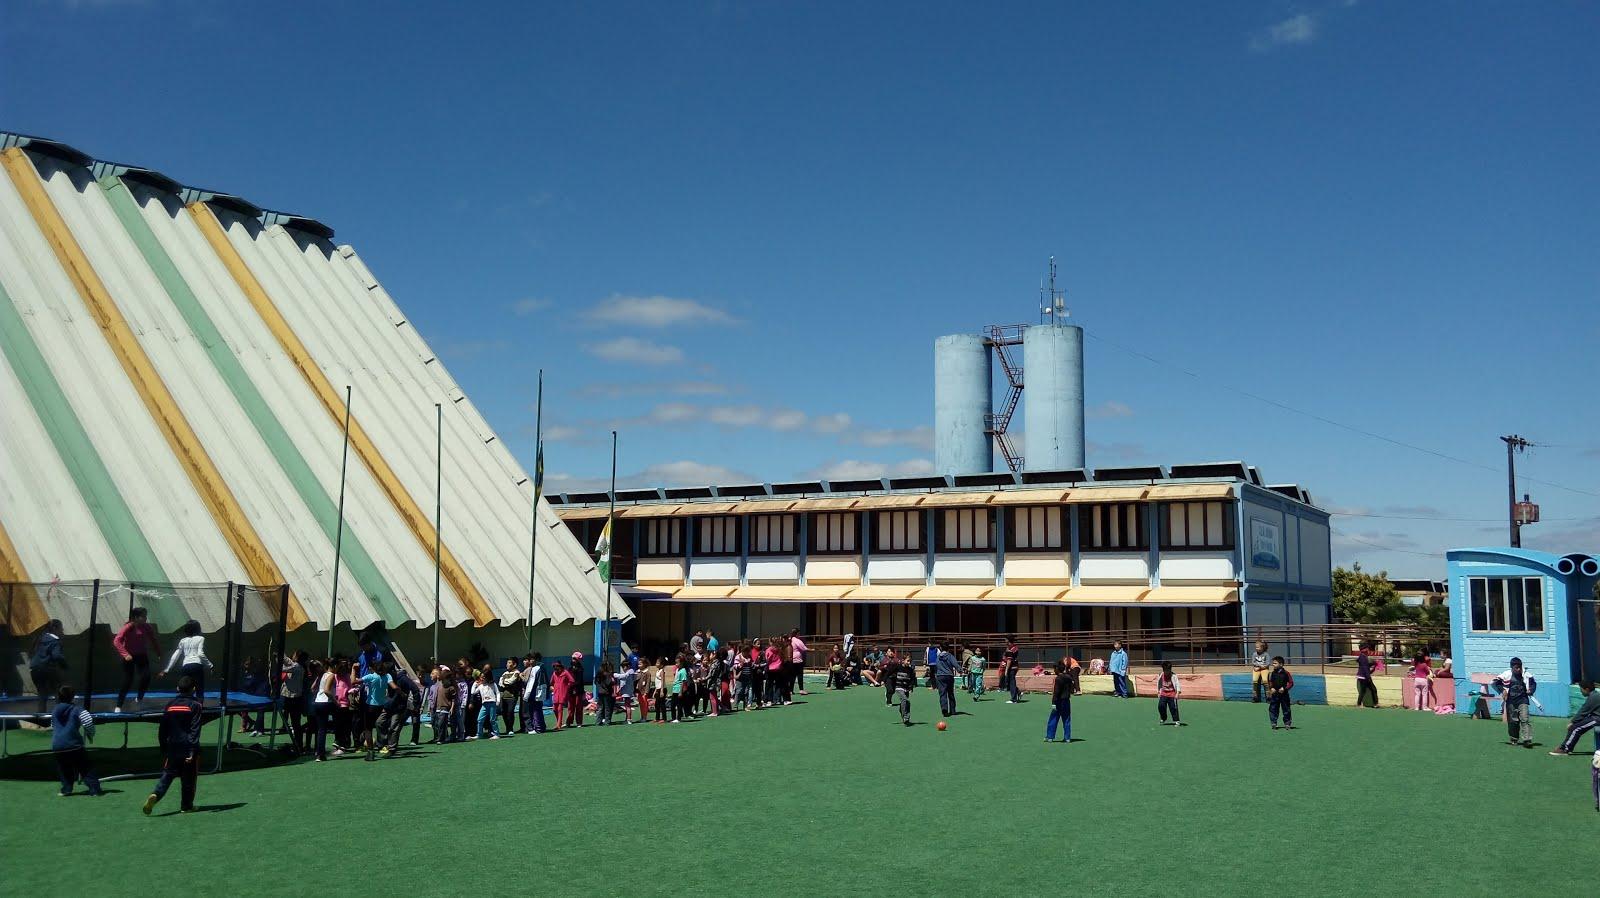 Centro Educacional Municipal Antônio Porto Burda